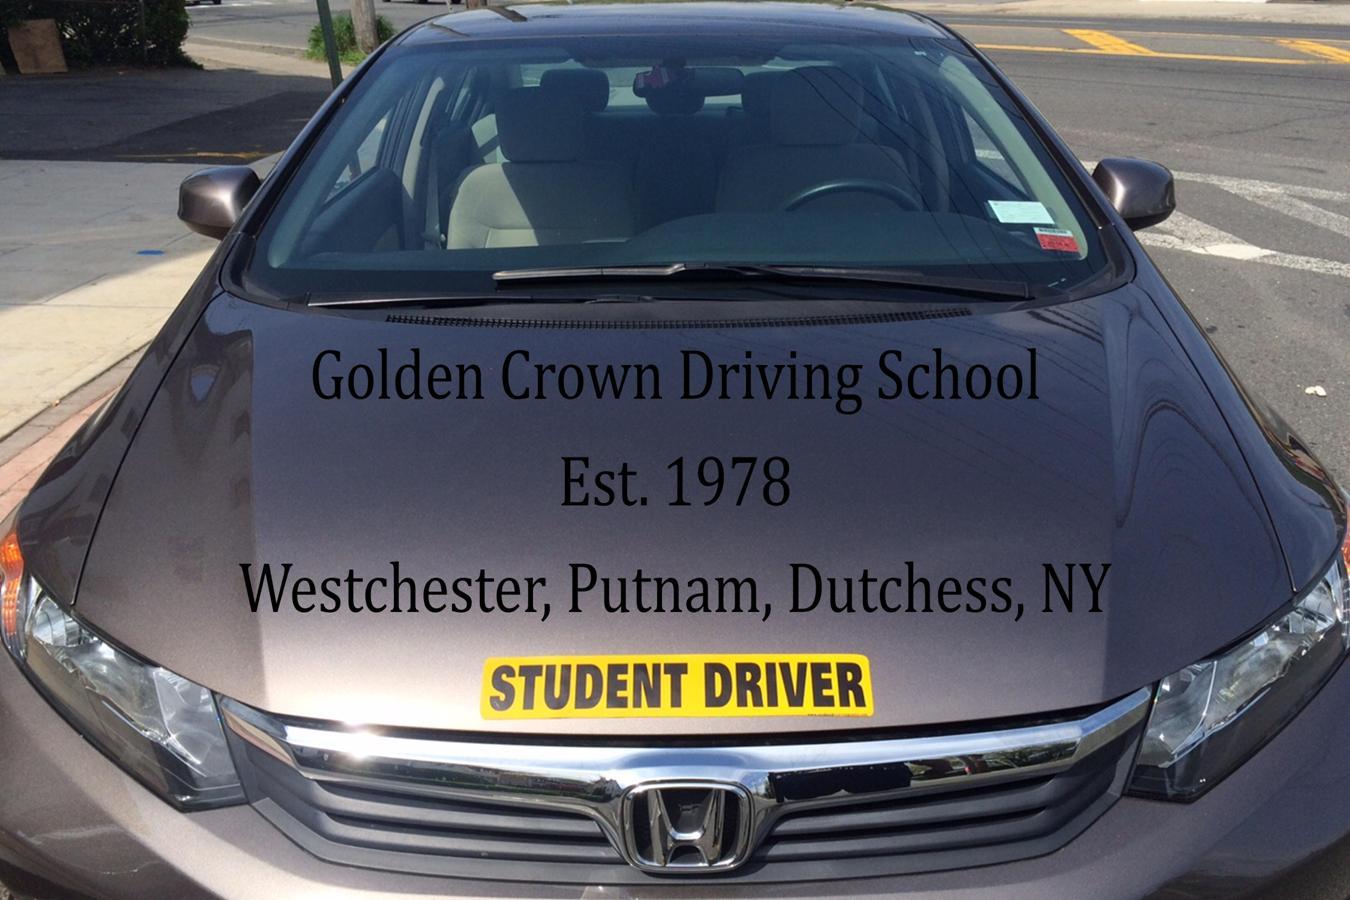 Golden Crown Driving School Driving Courses 5 Hour Courses